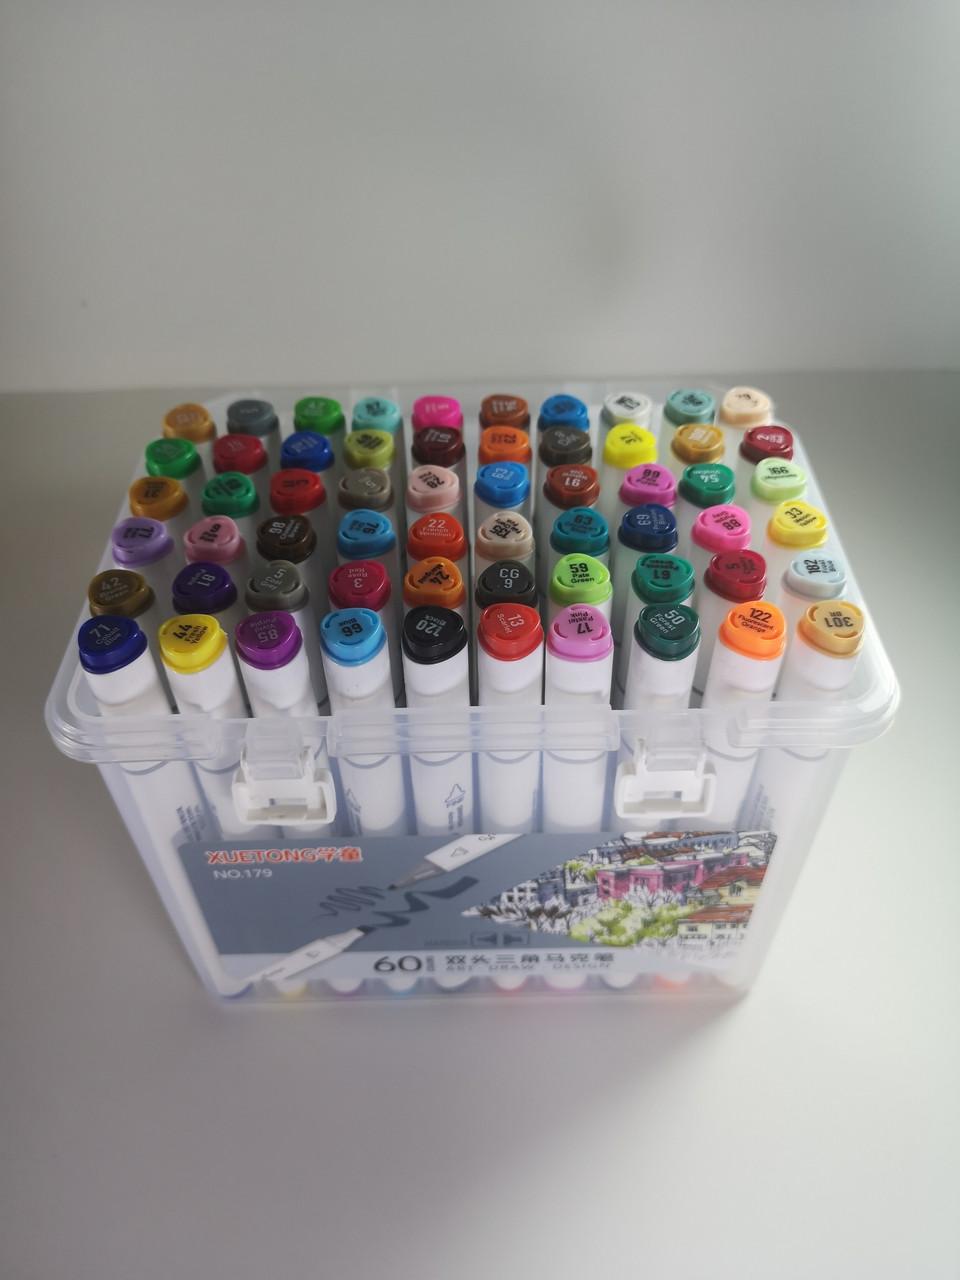 Маркеры Touch (тачмаркеры) толстые двусторонние Xuetong, 60 цветов